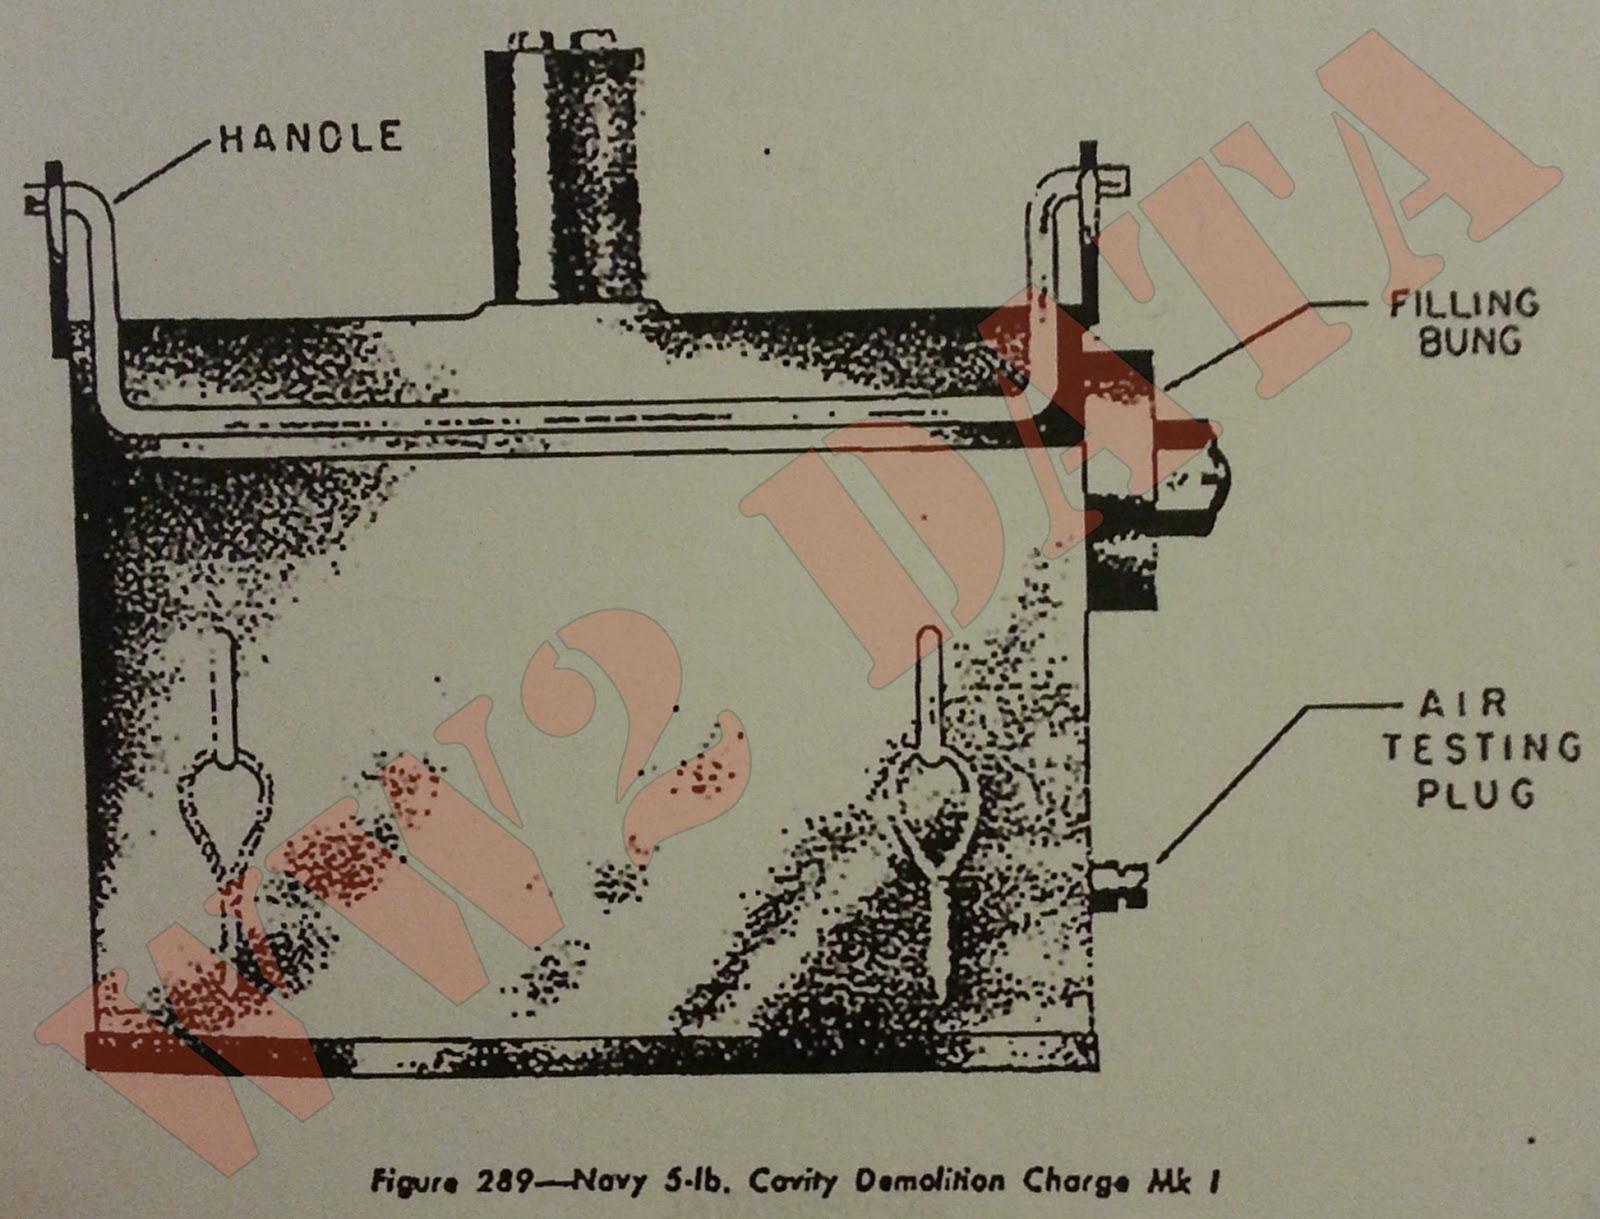 Ww2 Equipment Data British Explosive Ordnance Army And